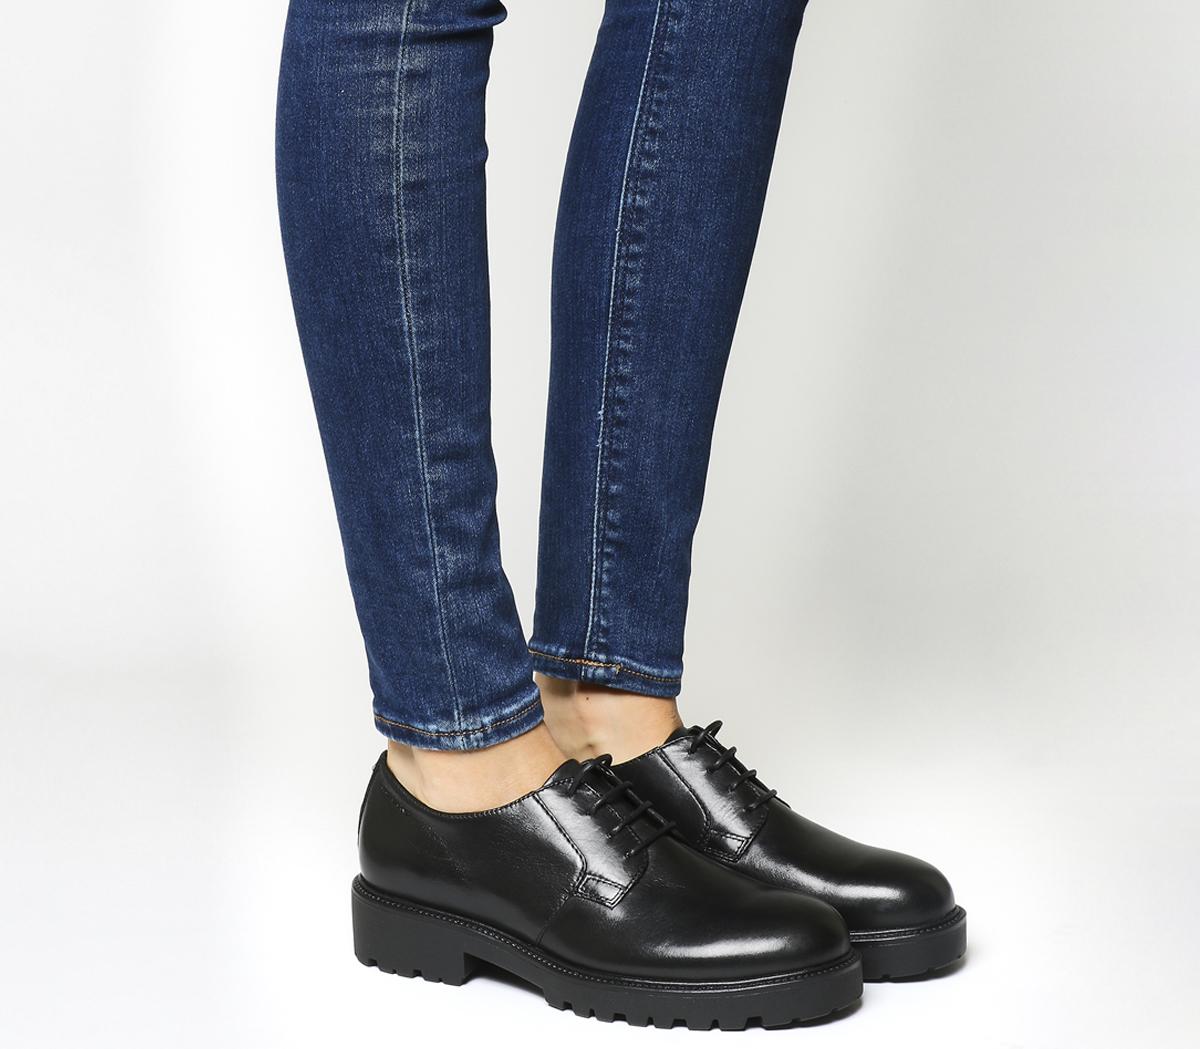 ad5bda99832 SENTINELLE Womens Vagabond Kenova dentelle Chaussures en cuir noir Flats